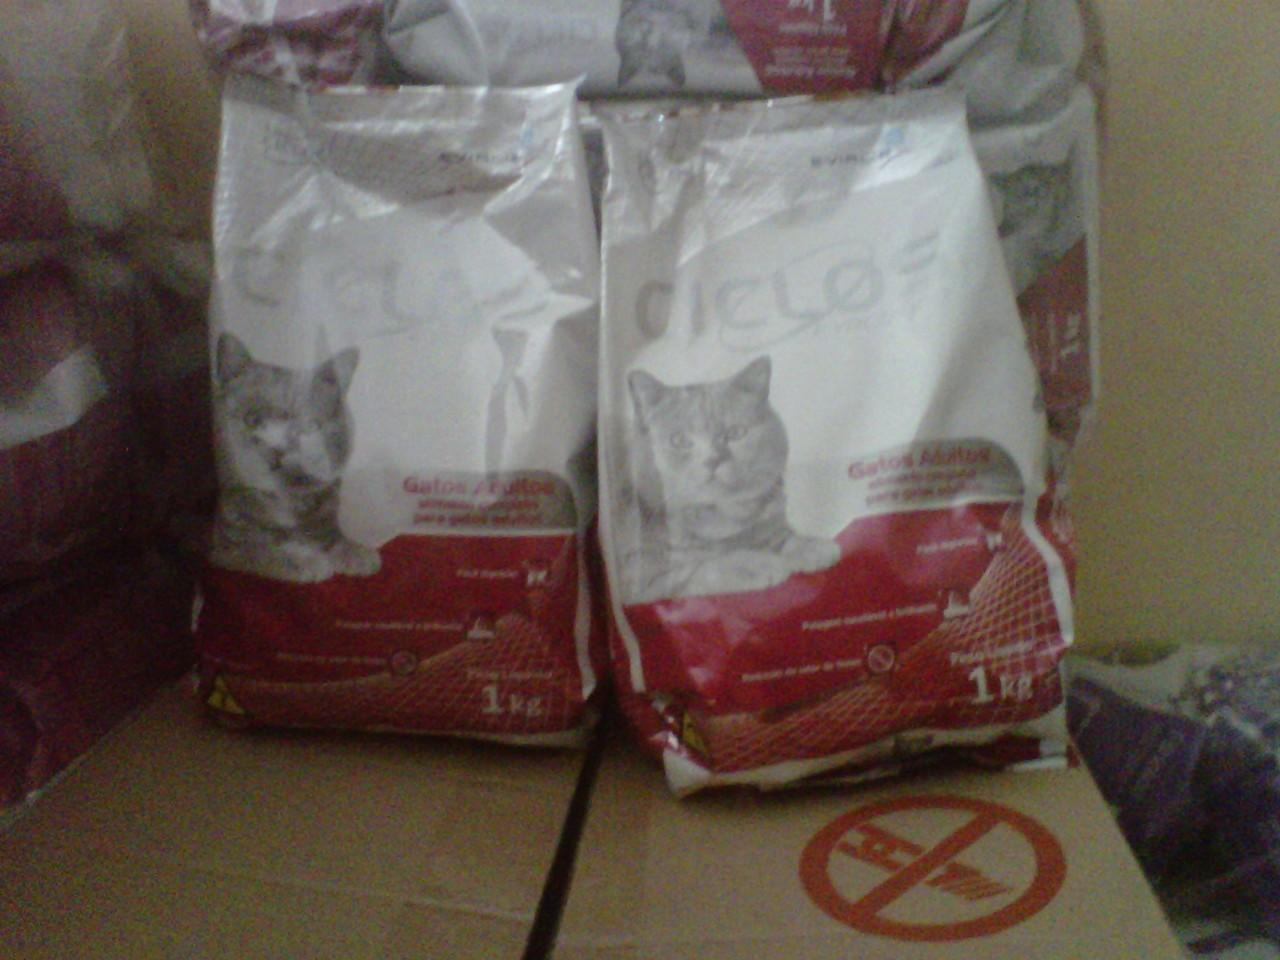 sale ciclos cat food 1kg